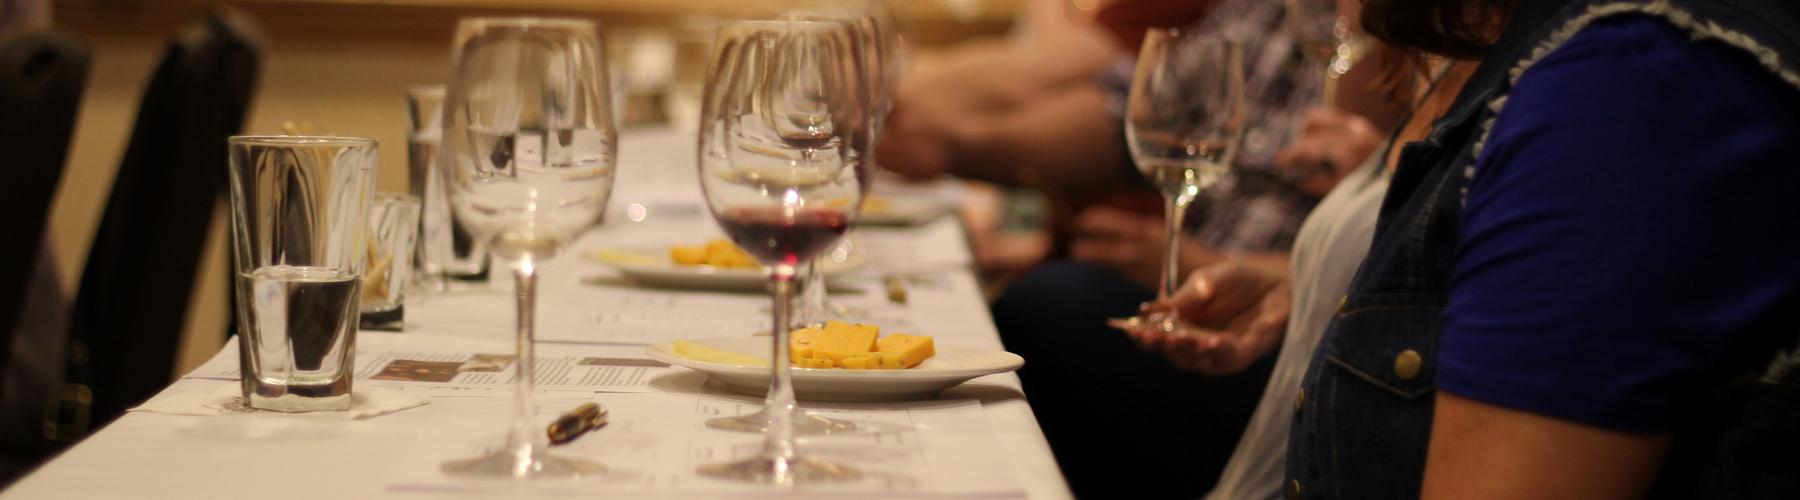 Wine seminar at Lake Geneva Festival of Wine